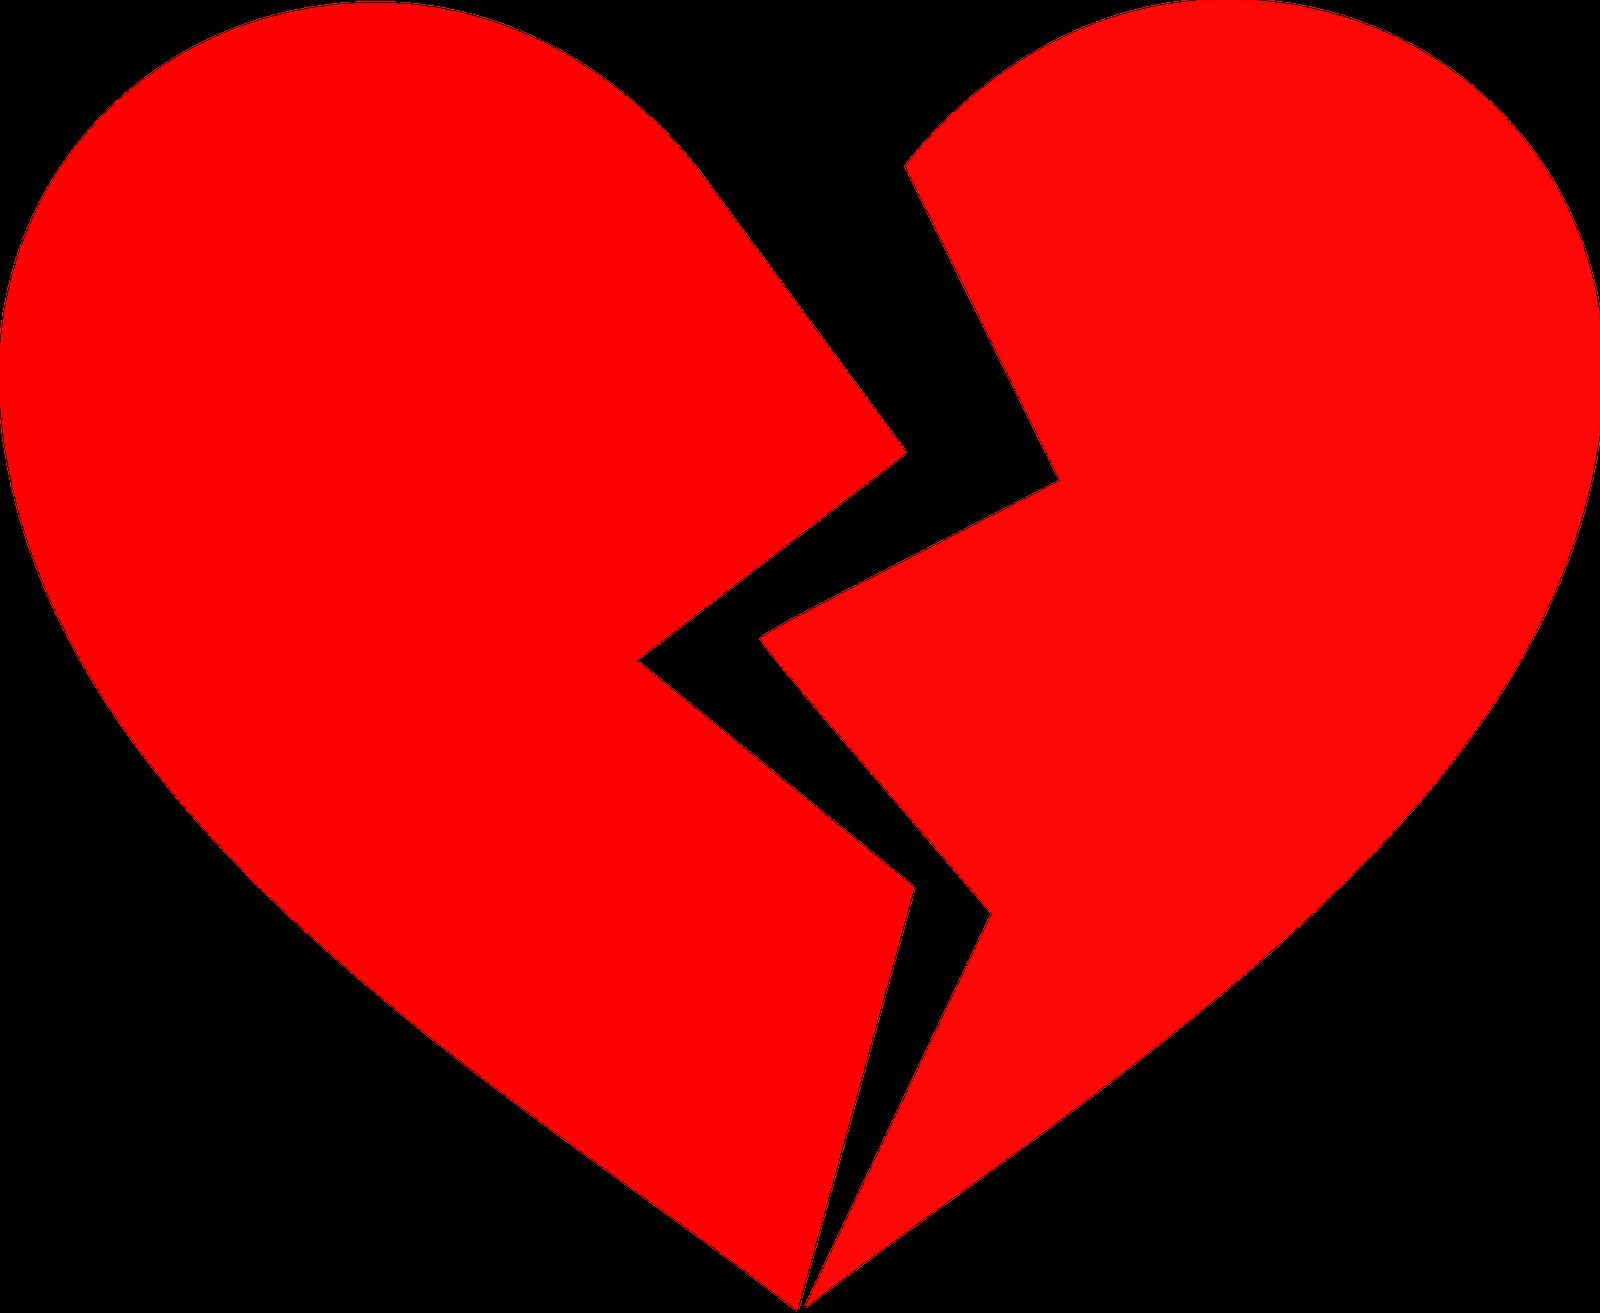 Broken Heart Clip Art | Clipart Panda - Free Clipart Images